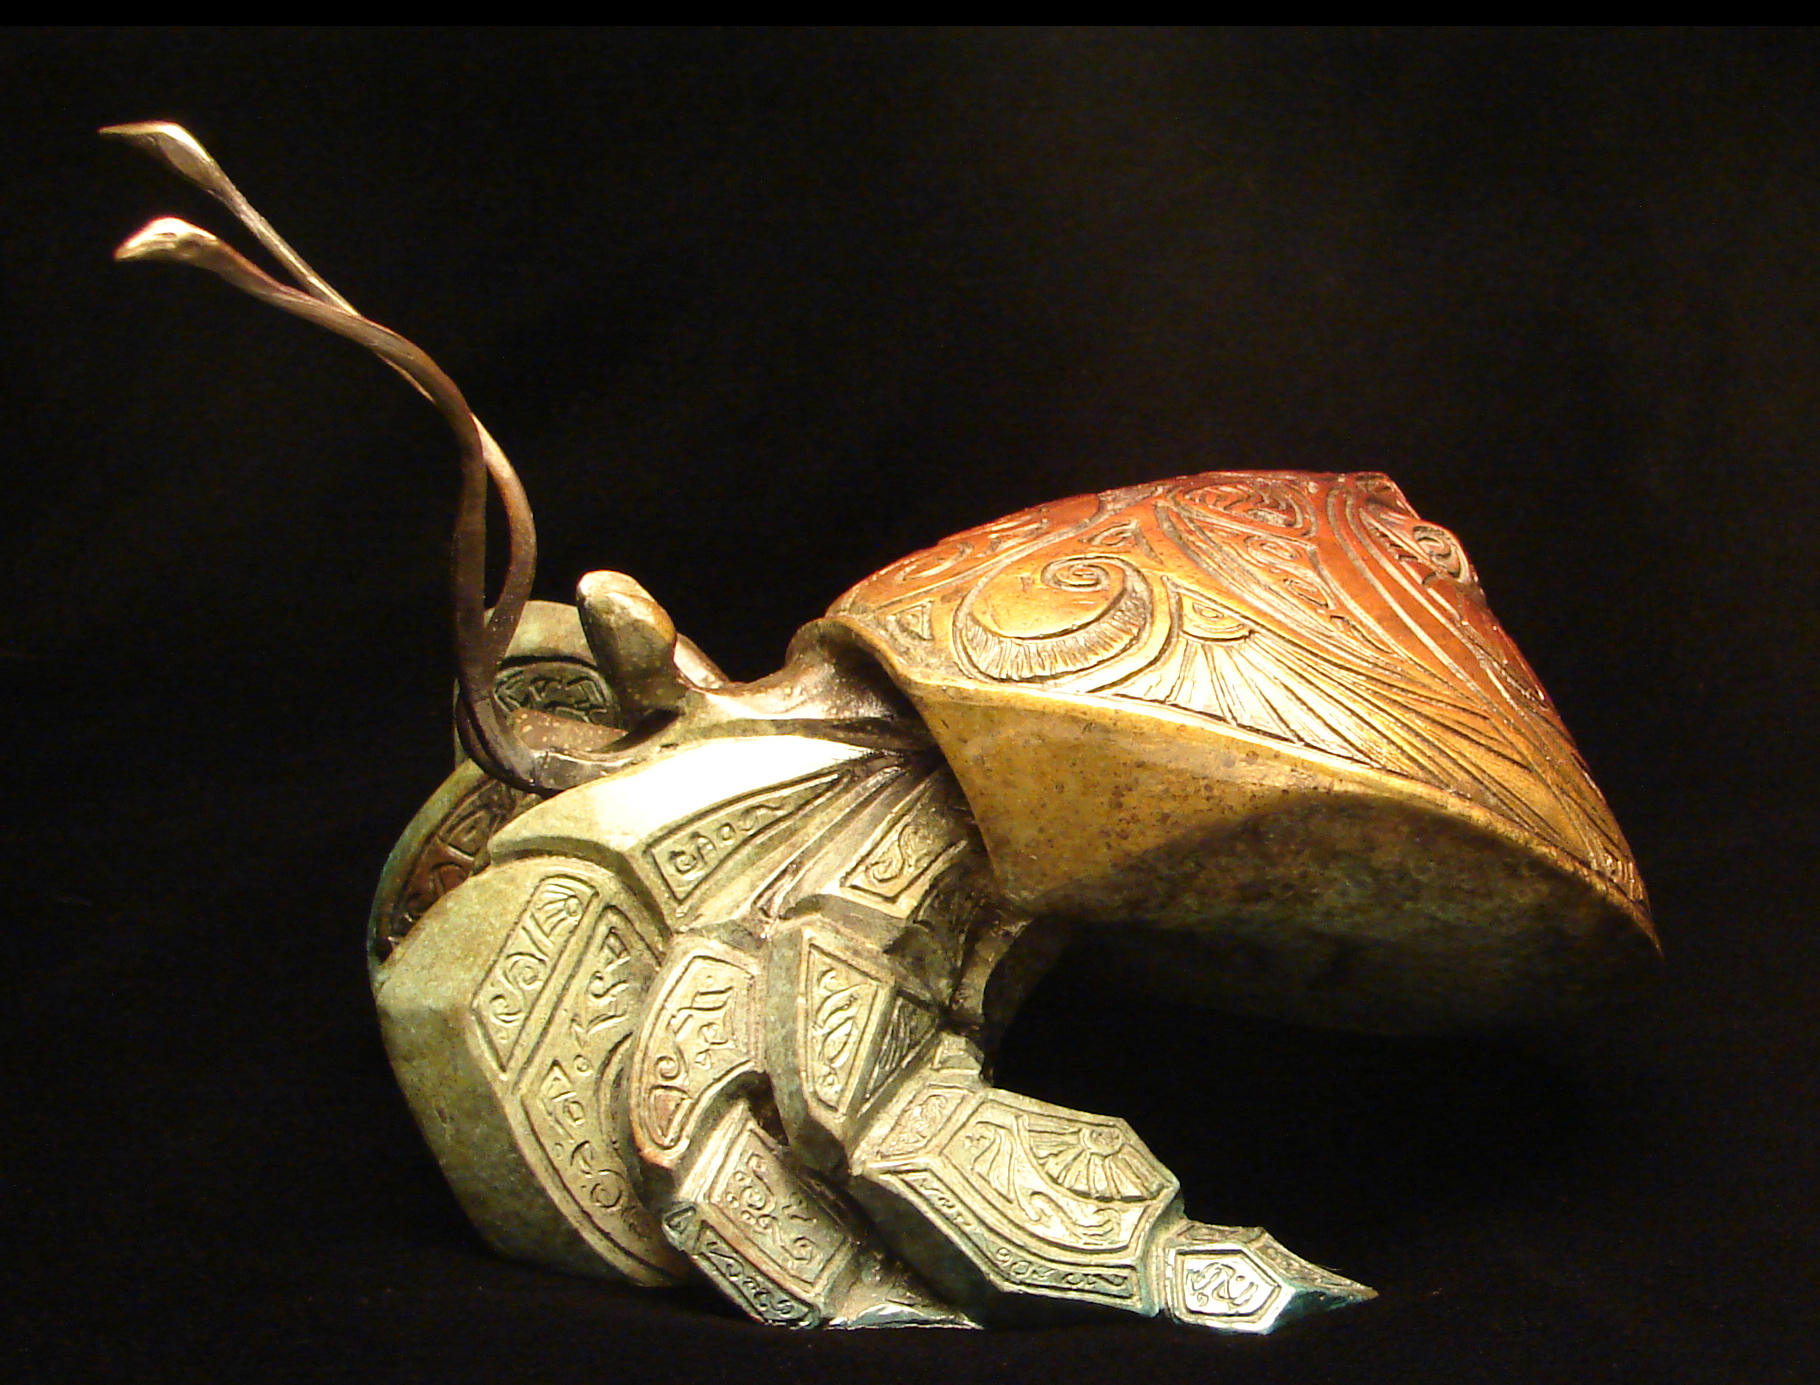 bronze-crab-sculpture-john-maisano-2.jpg